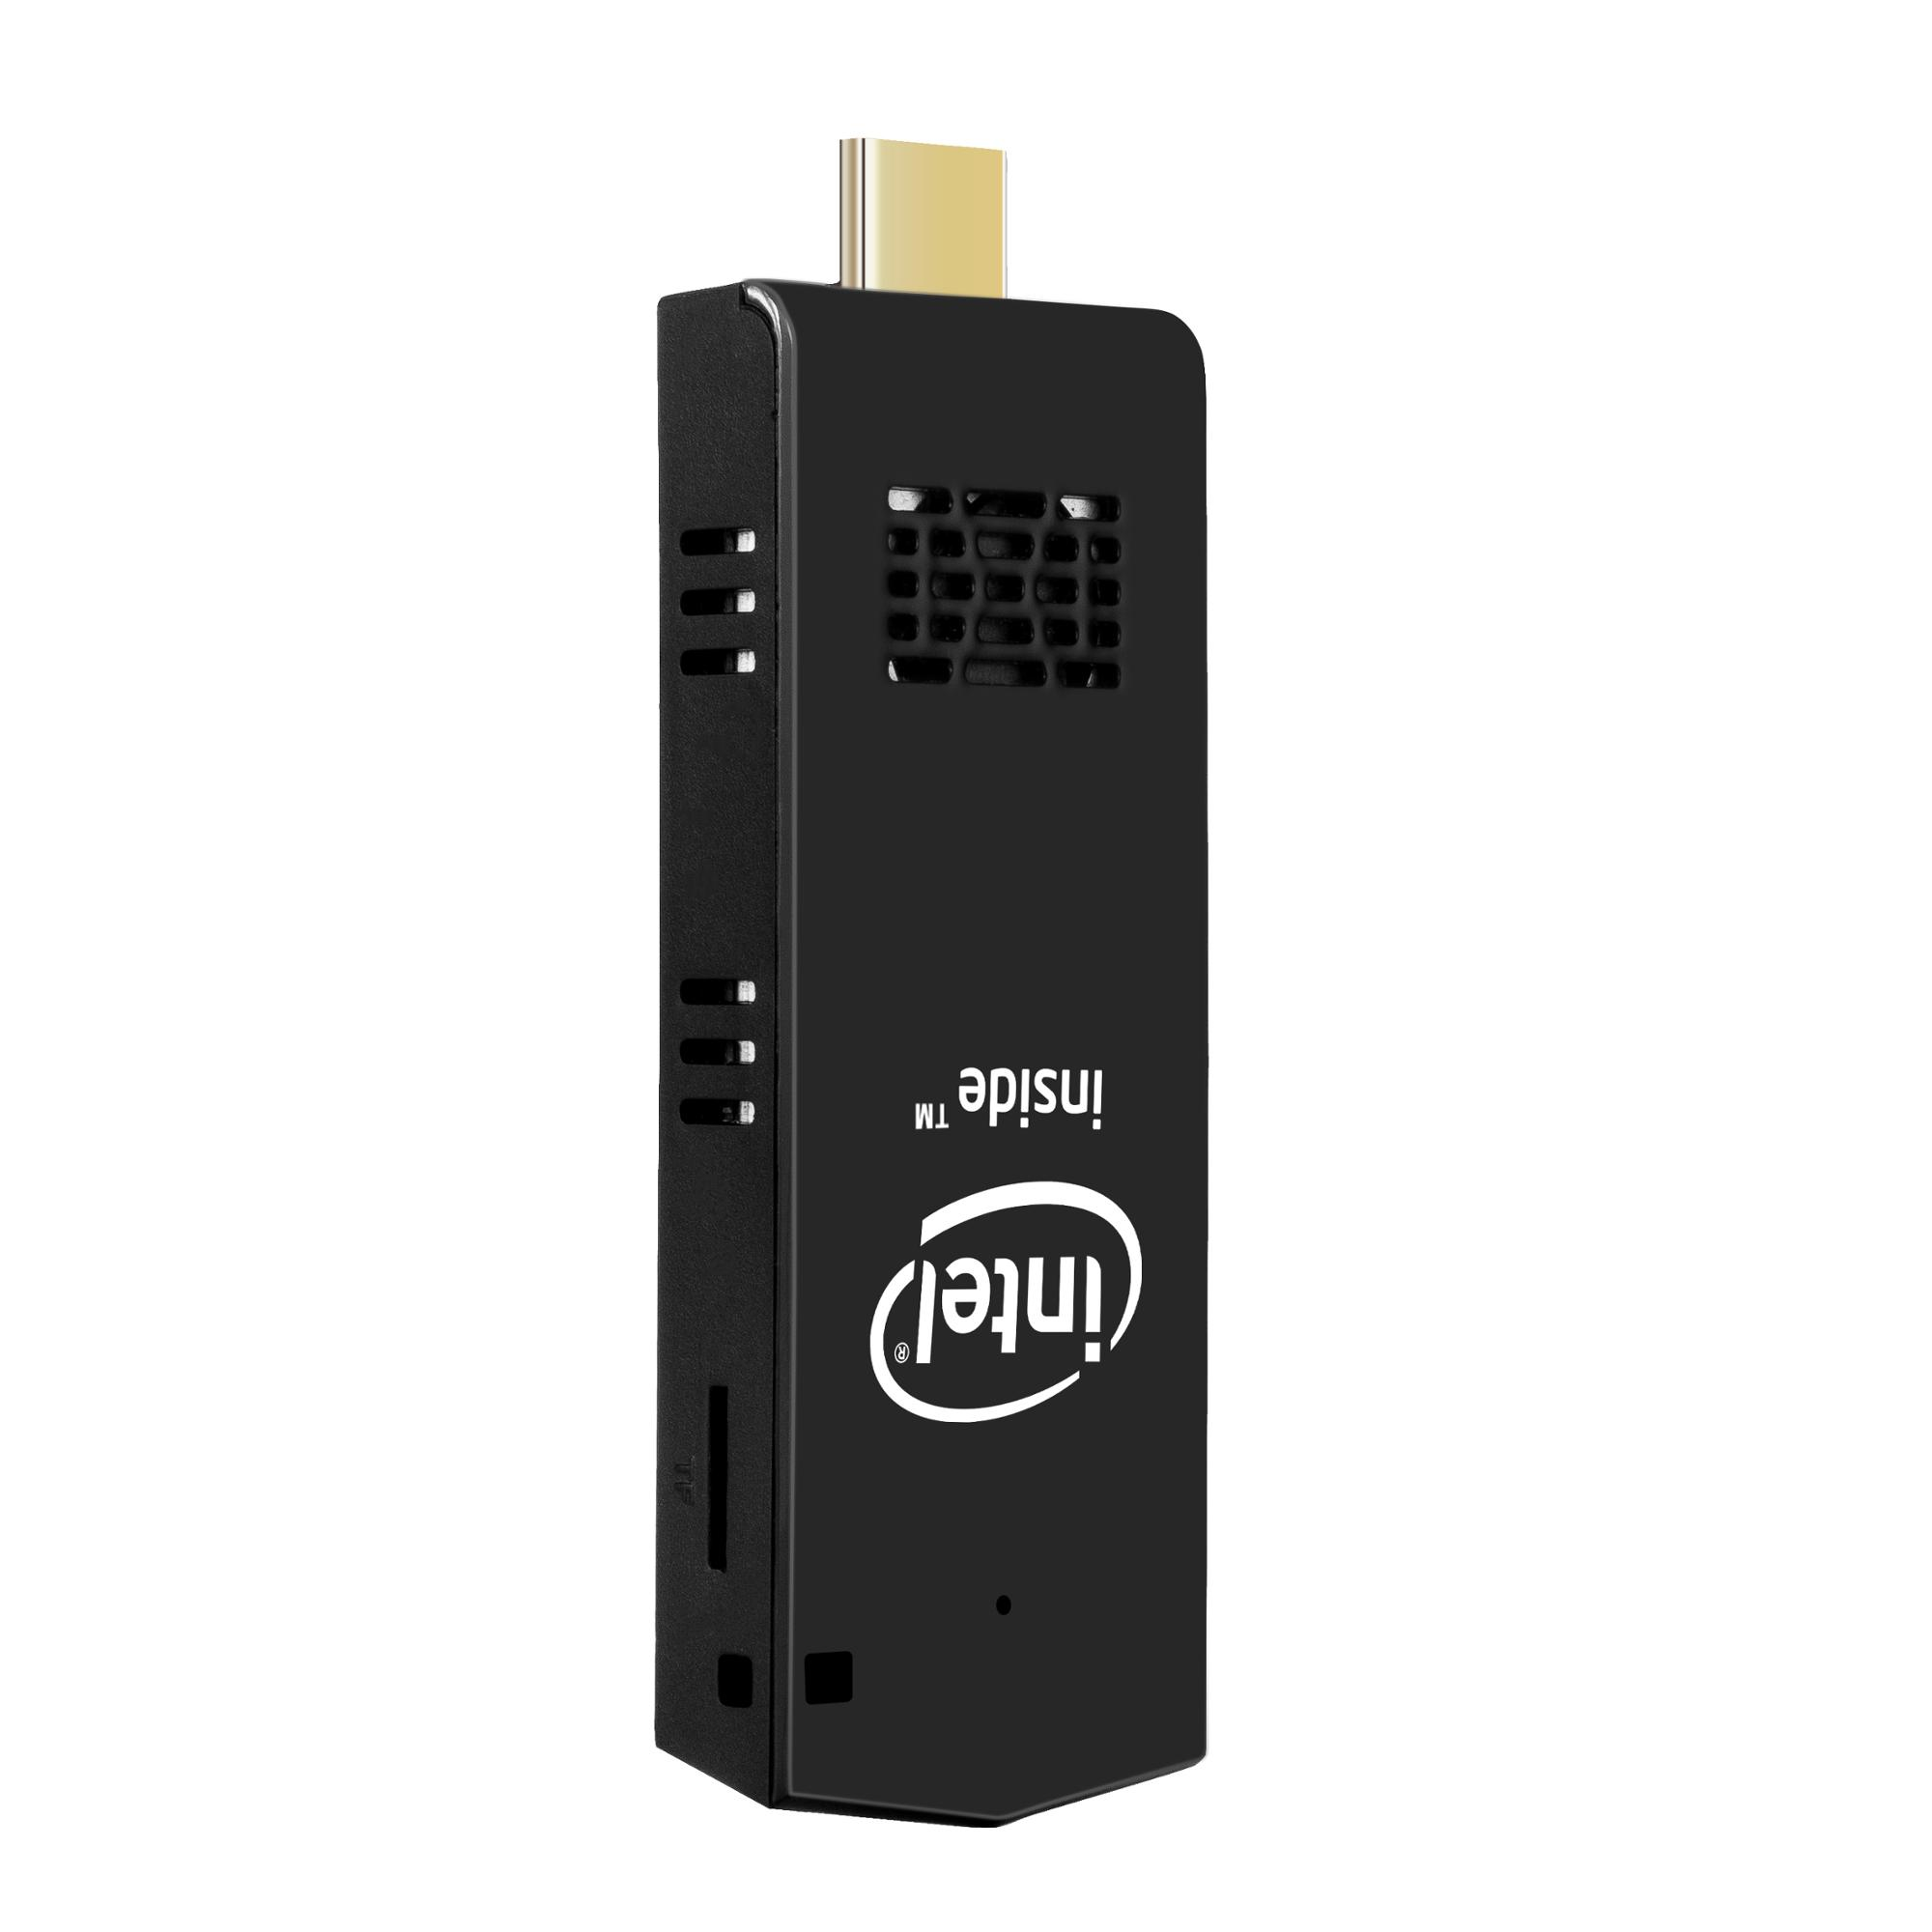 W5 Pro MINI PC Intel Atom Z8350 Quad Core 1.44GHz 2GB/32GB 4Gb/64GB Windows10 TV Stick Win10 Computer Micro Pc 2.4G &5.8G Wifi